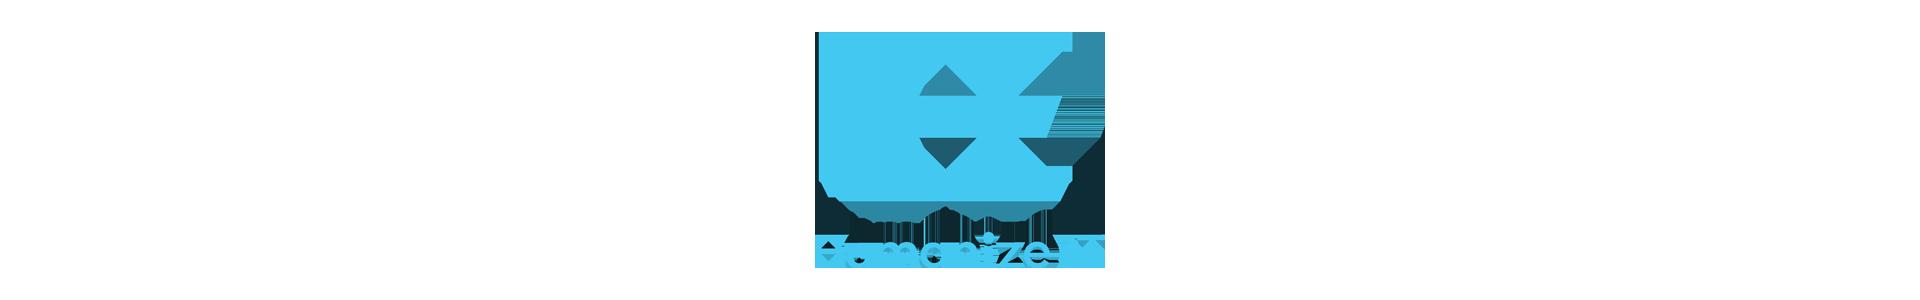 humanize_it_header_full_width